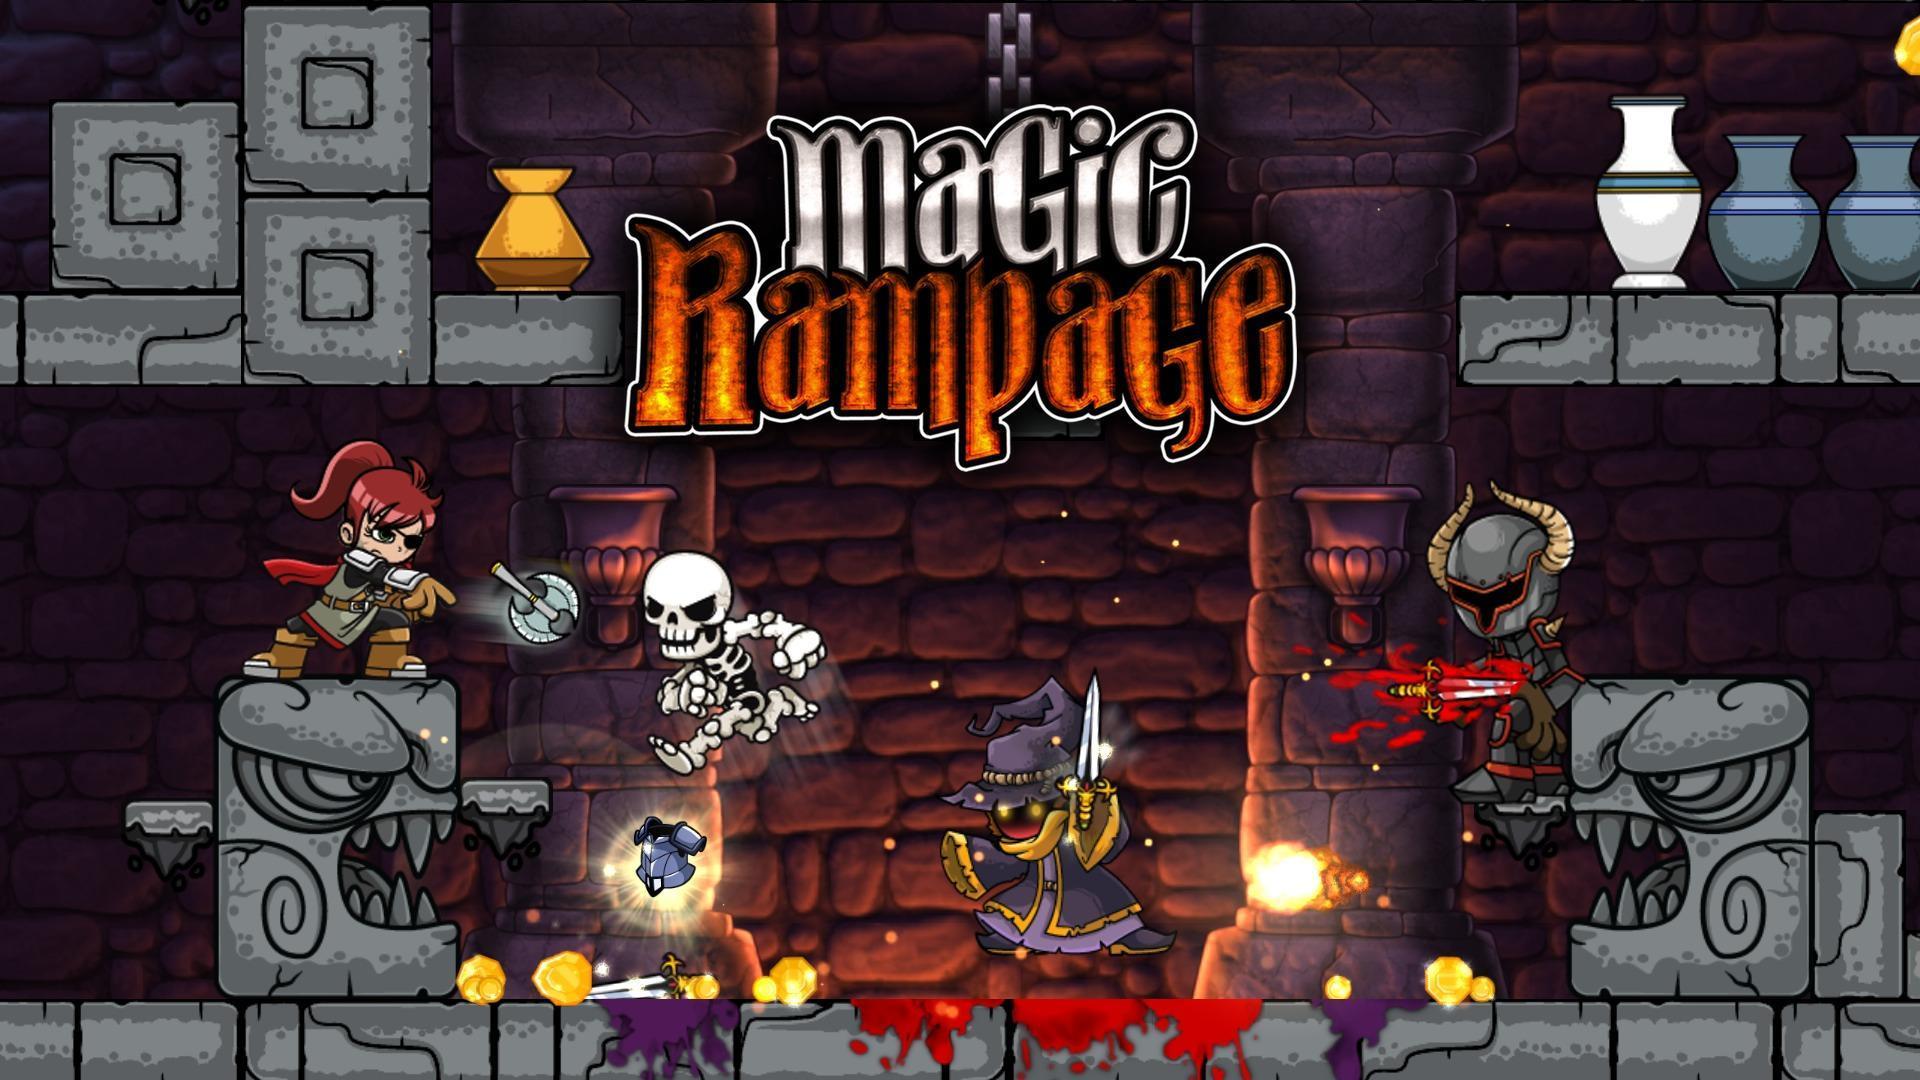 9 игр для андроид, работающих без интернета - magic rampage